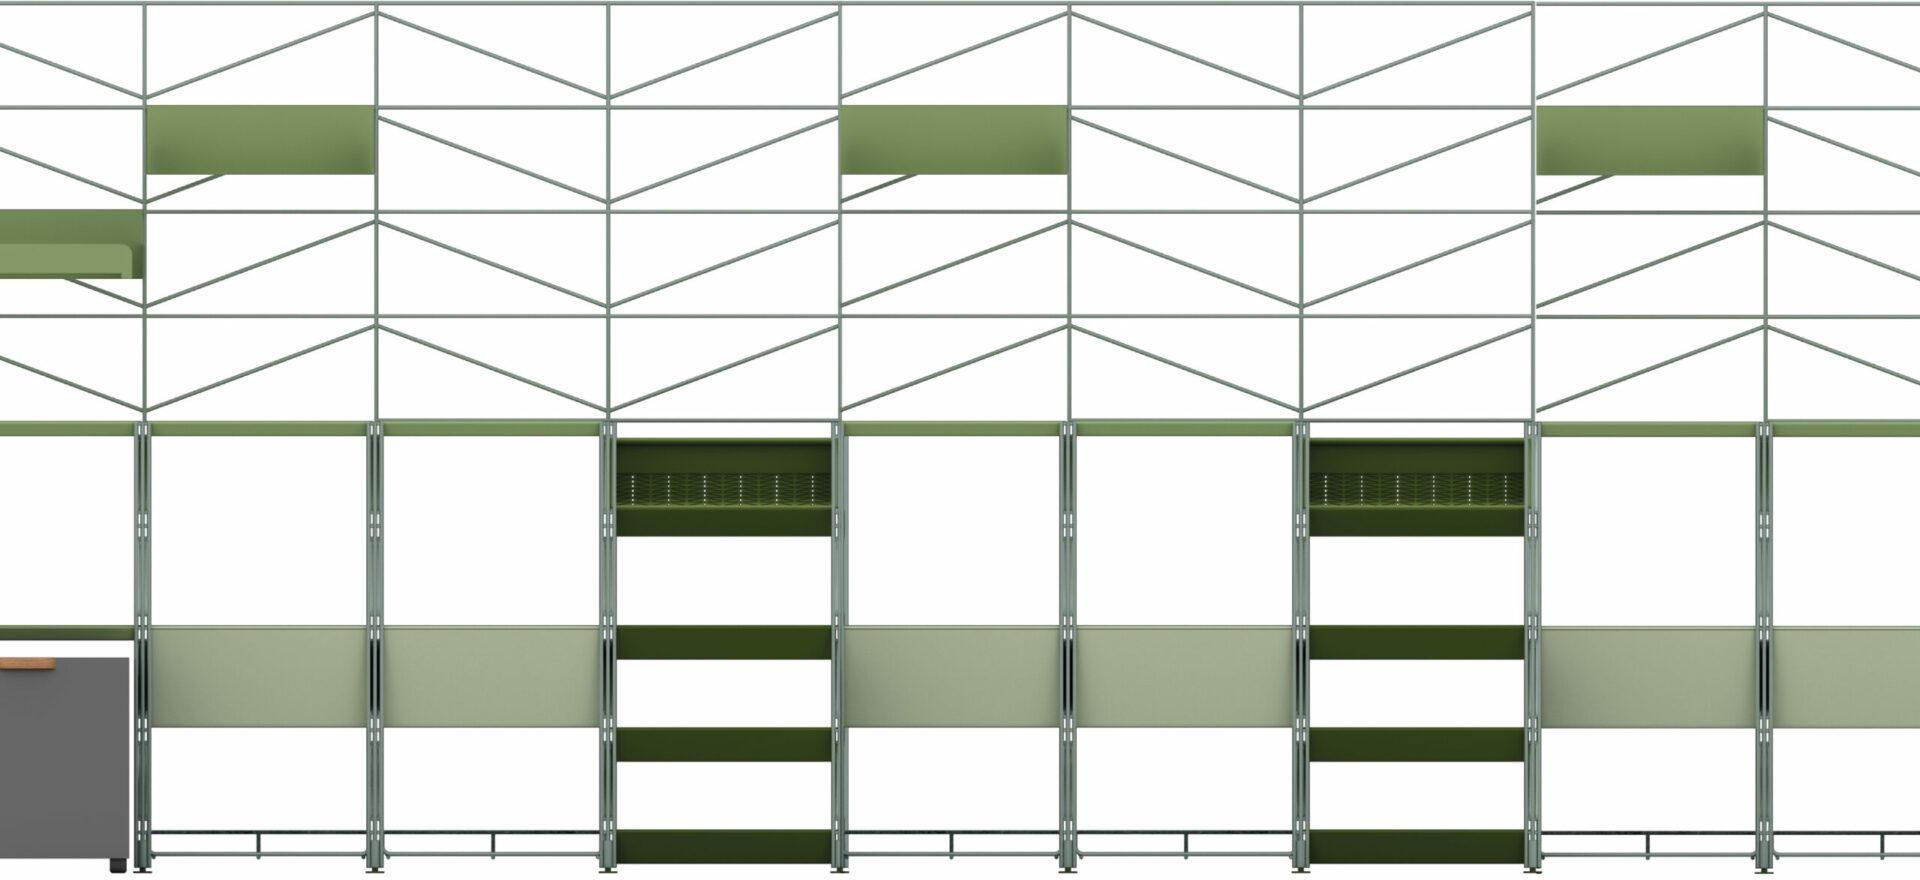 Socrate Outdoor_Outdoor Furniture_Caimi__Pattern_Mario Trimarchi Design